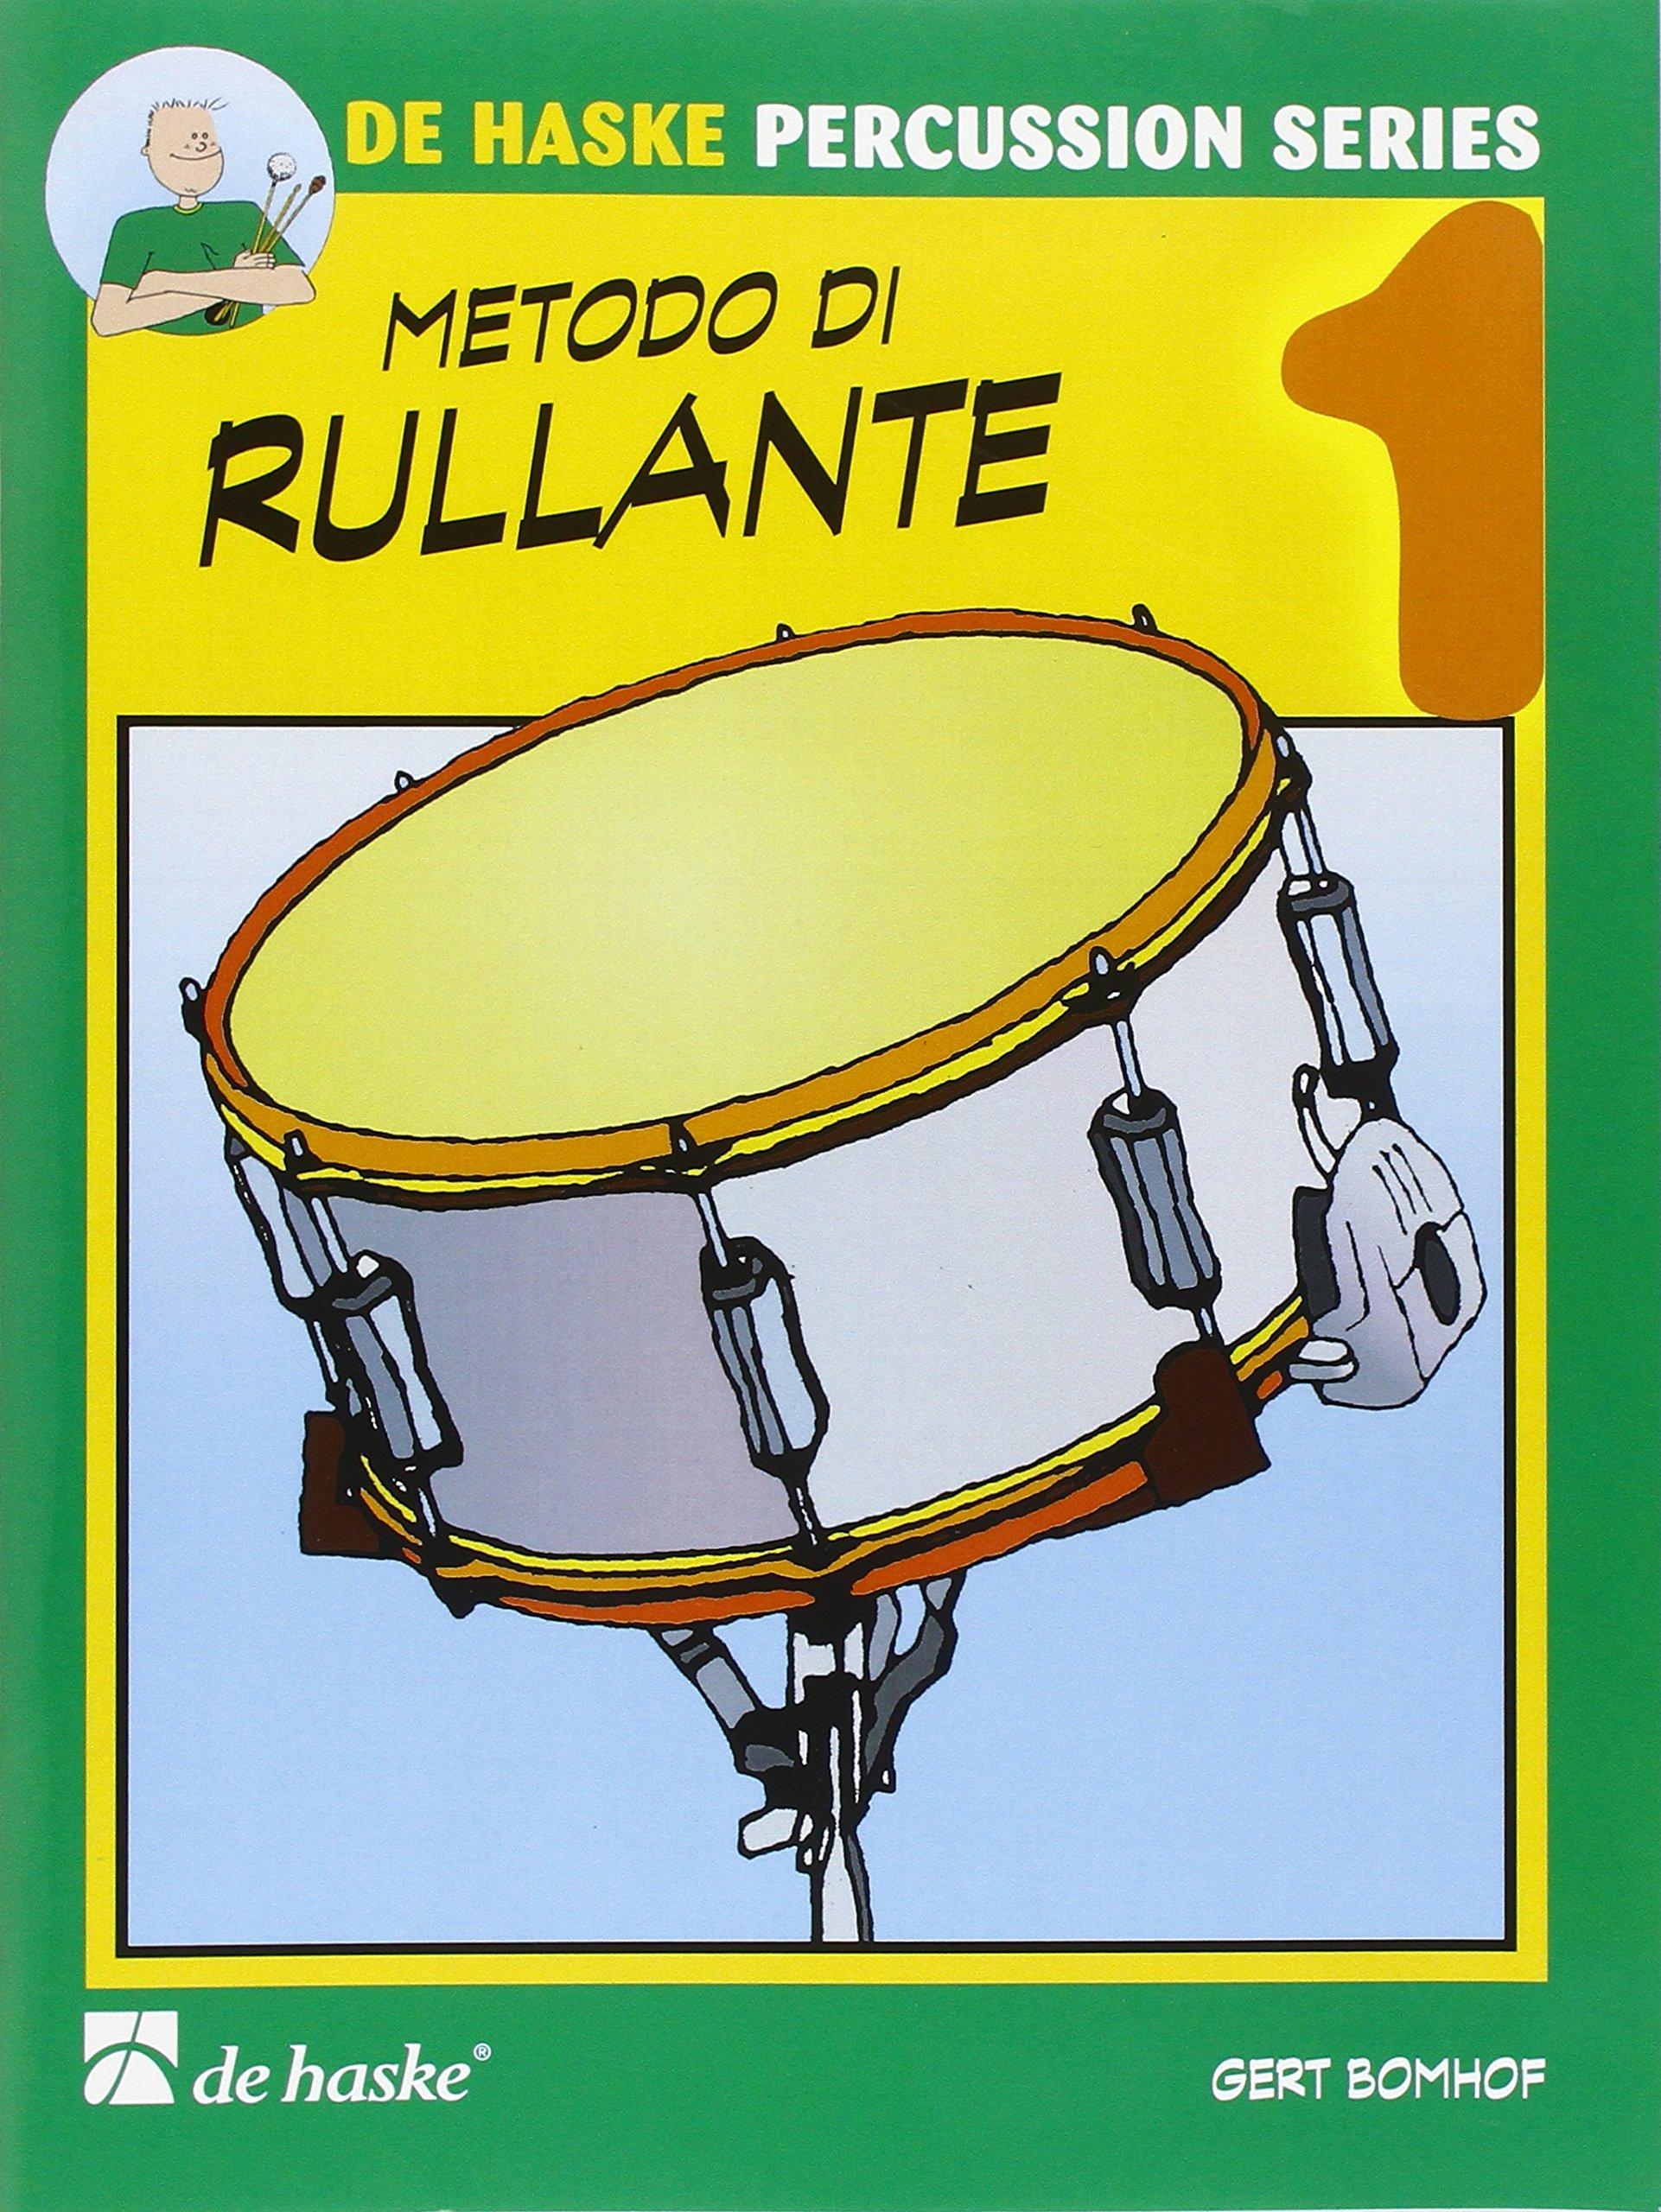 Metodo di Rullante Vol. 1 Copertina flessibile – 1 gen 2010 Gert Bomhof De Haske Publications 9043134457 Musique